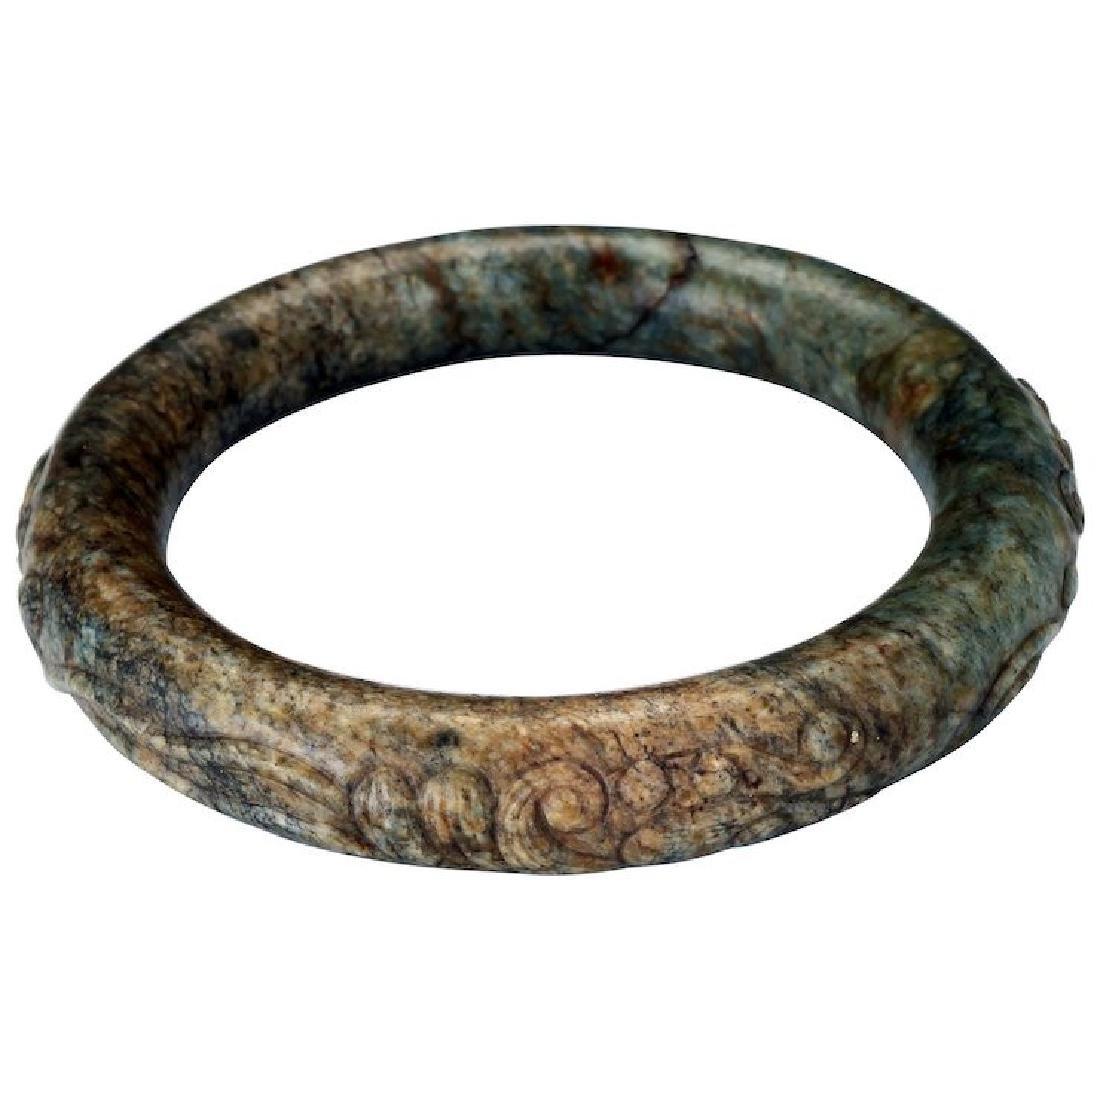 Chinese toroid form 63 mm mottled hardstone bangle